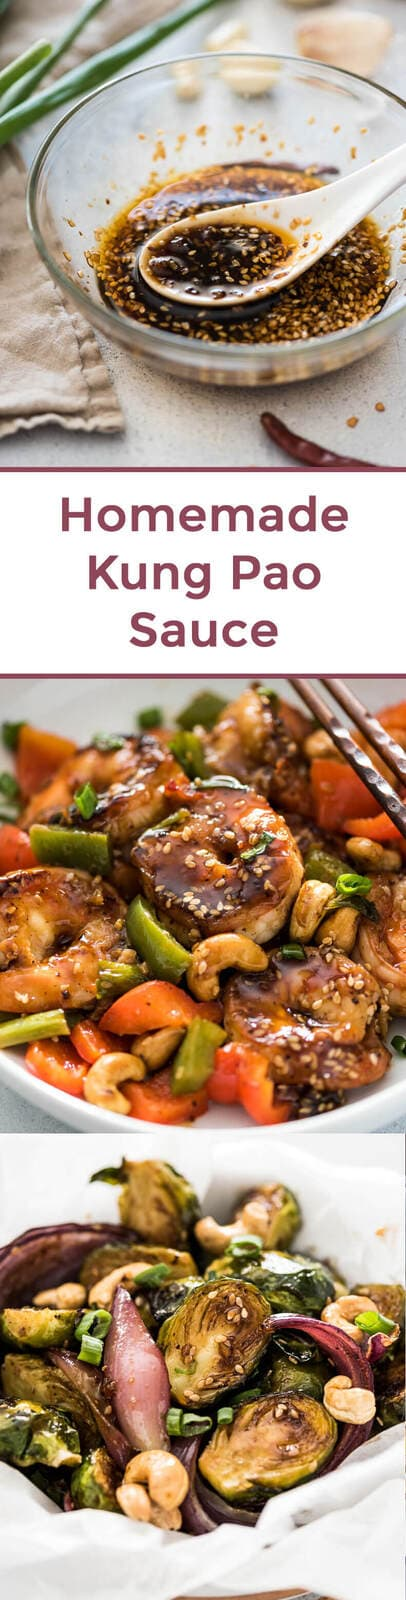 Homemade Kung Pao Sauce - Chinese Sauce   Stir Fry Sauce   Chinese Food   Chinese Recipes   Asian sauce